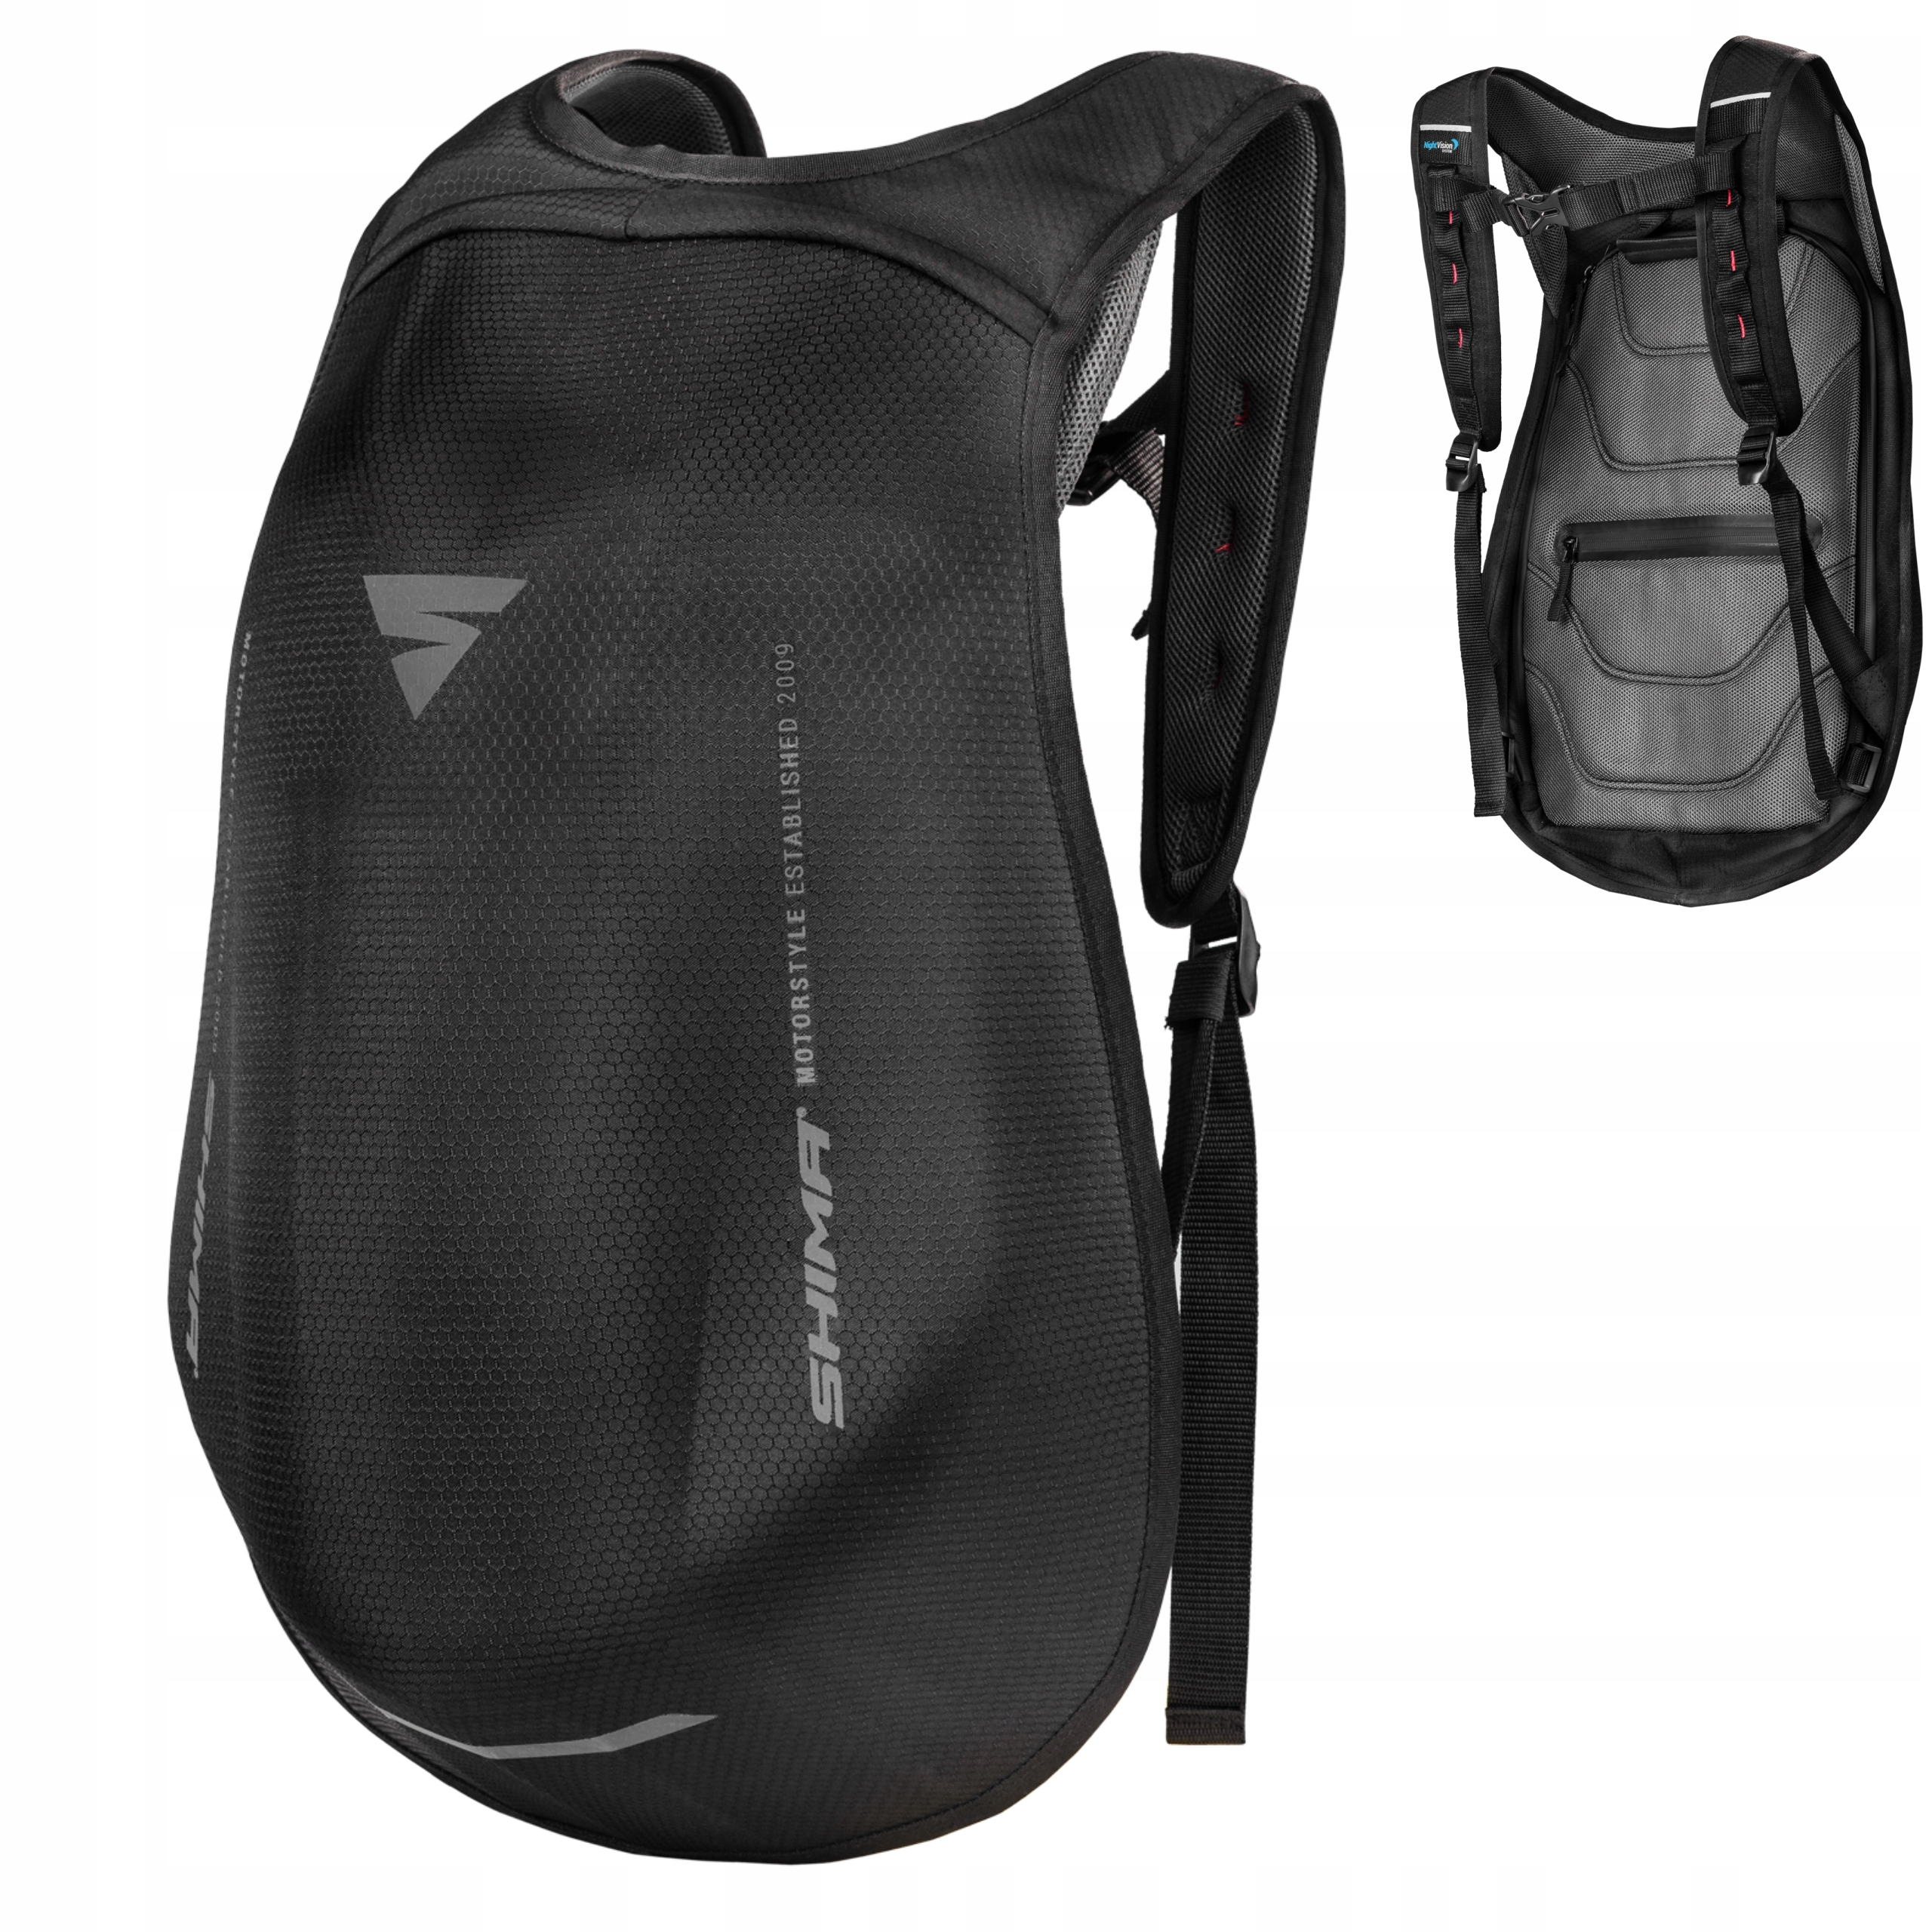 Plecak motocyklowy SHIMA AYRO laptop 24l GRATIS